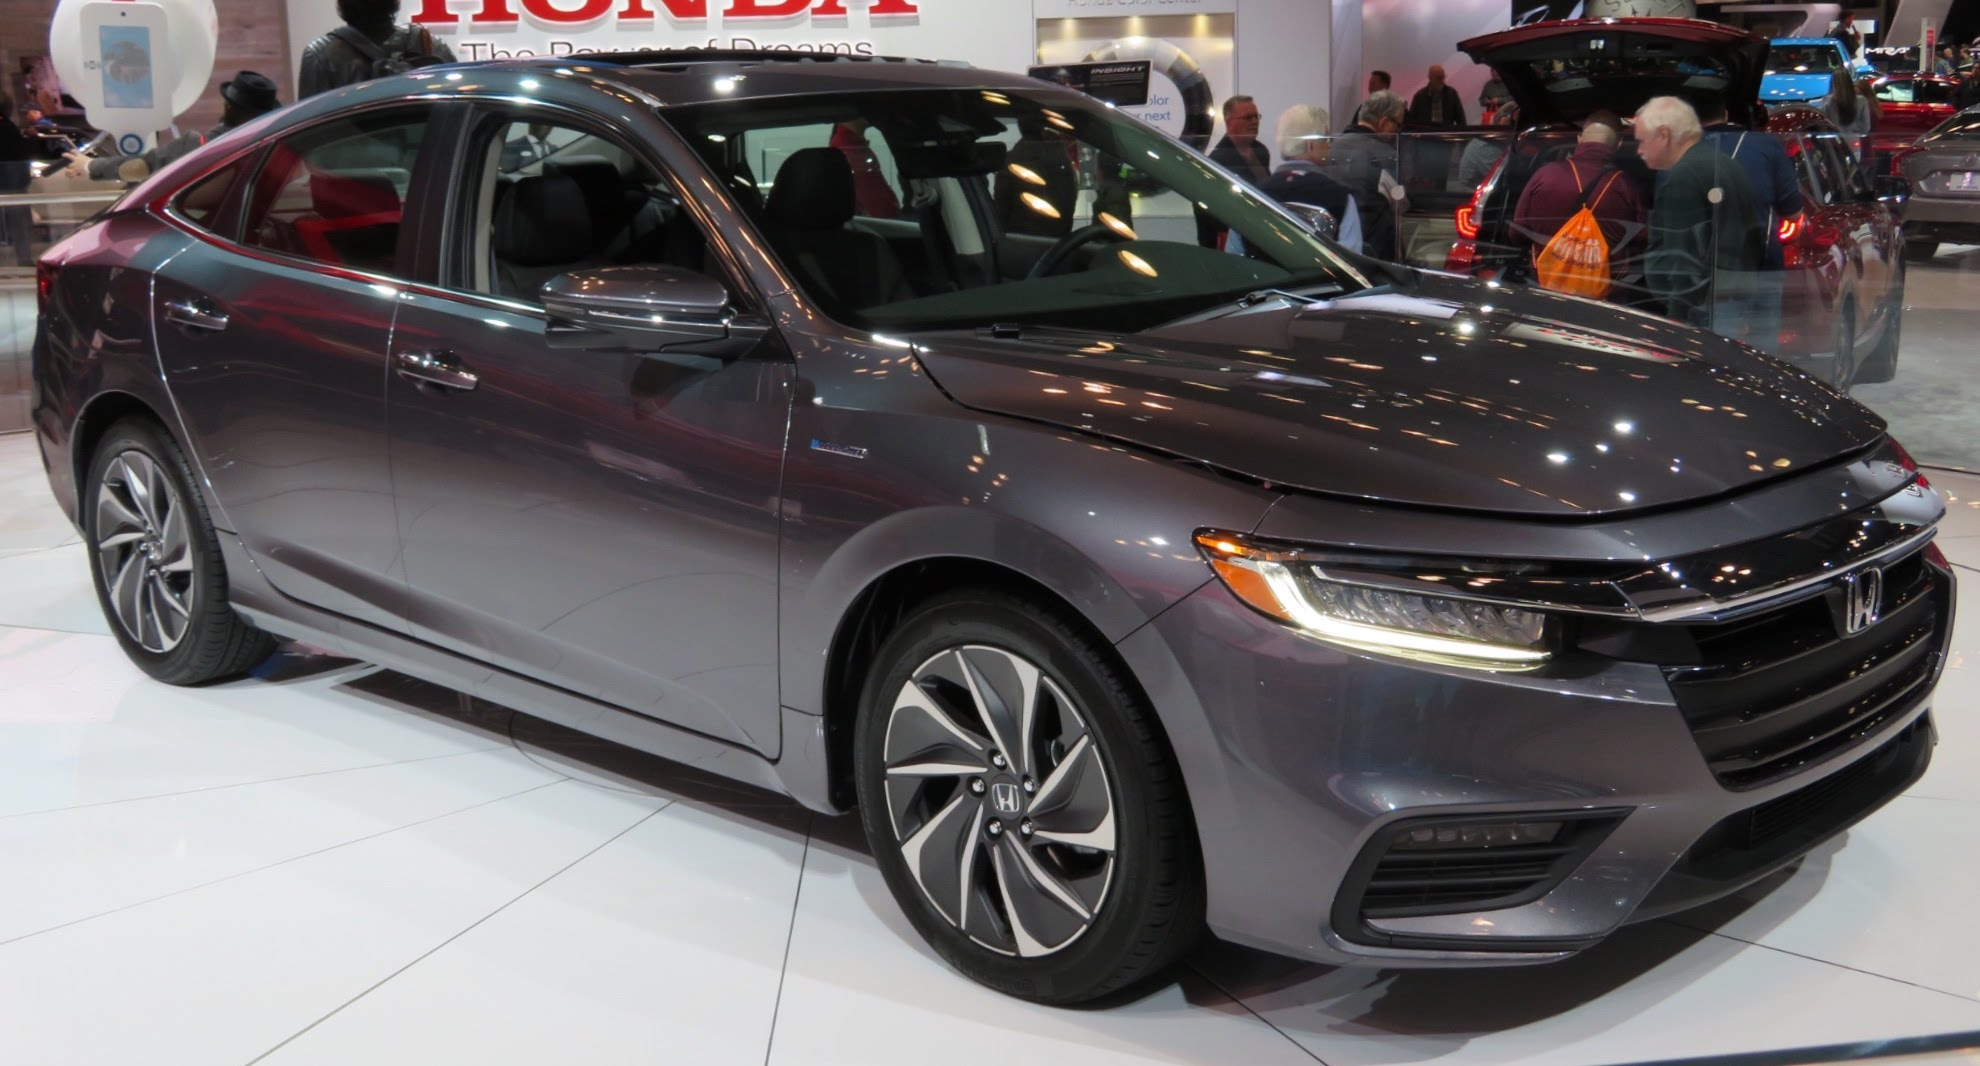 New York Honda Yamaha Reviews